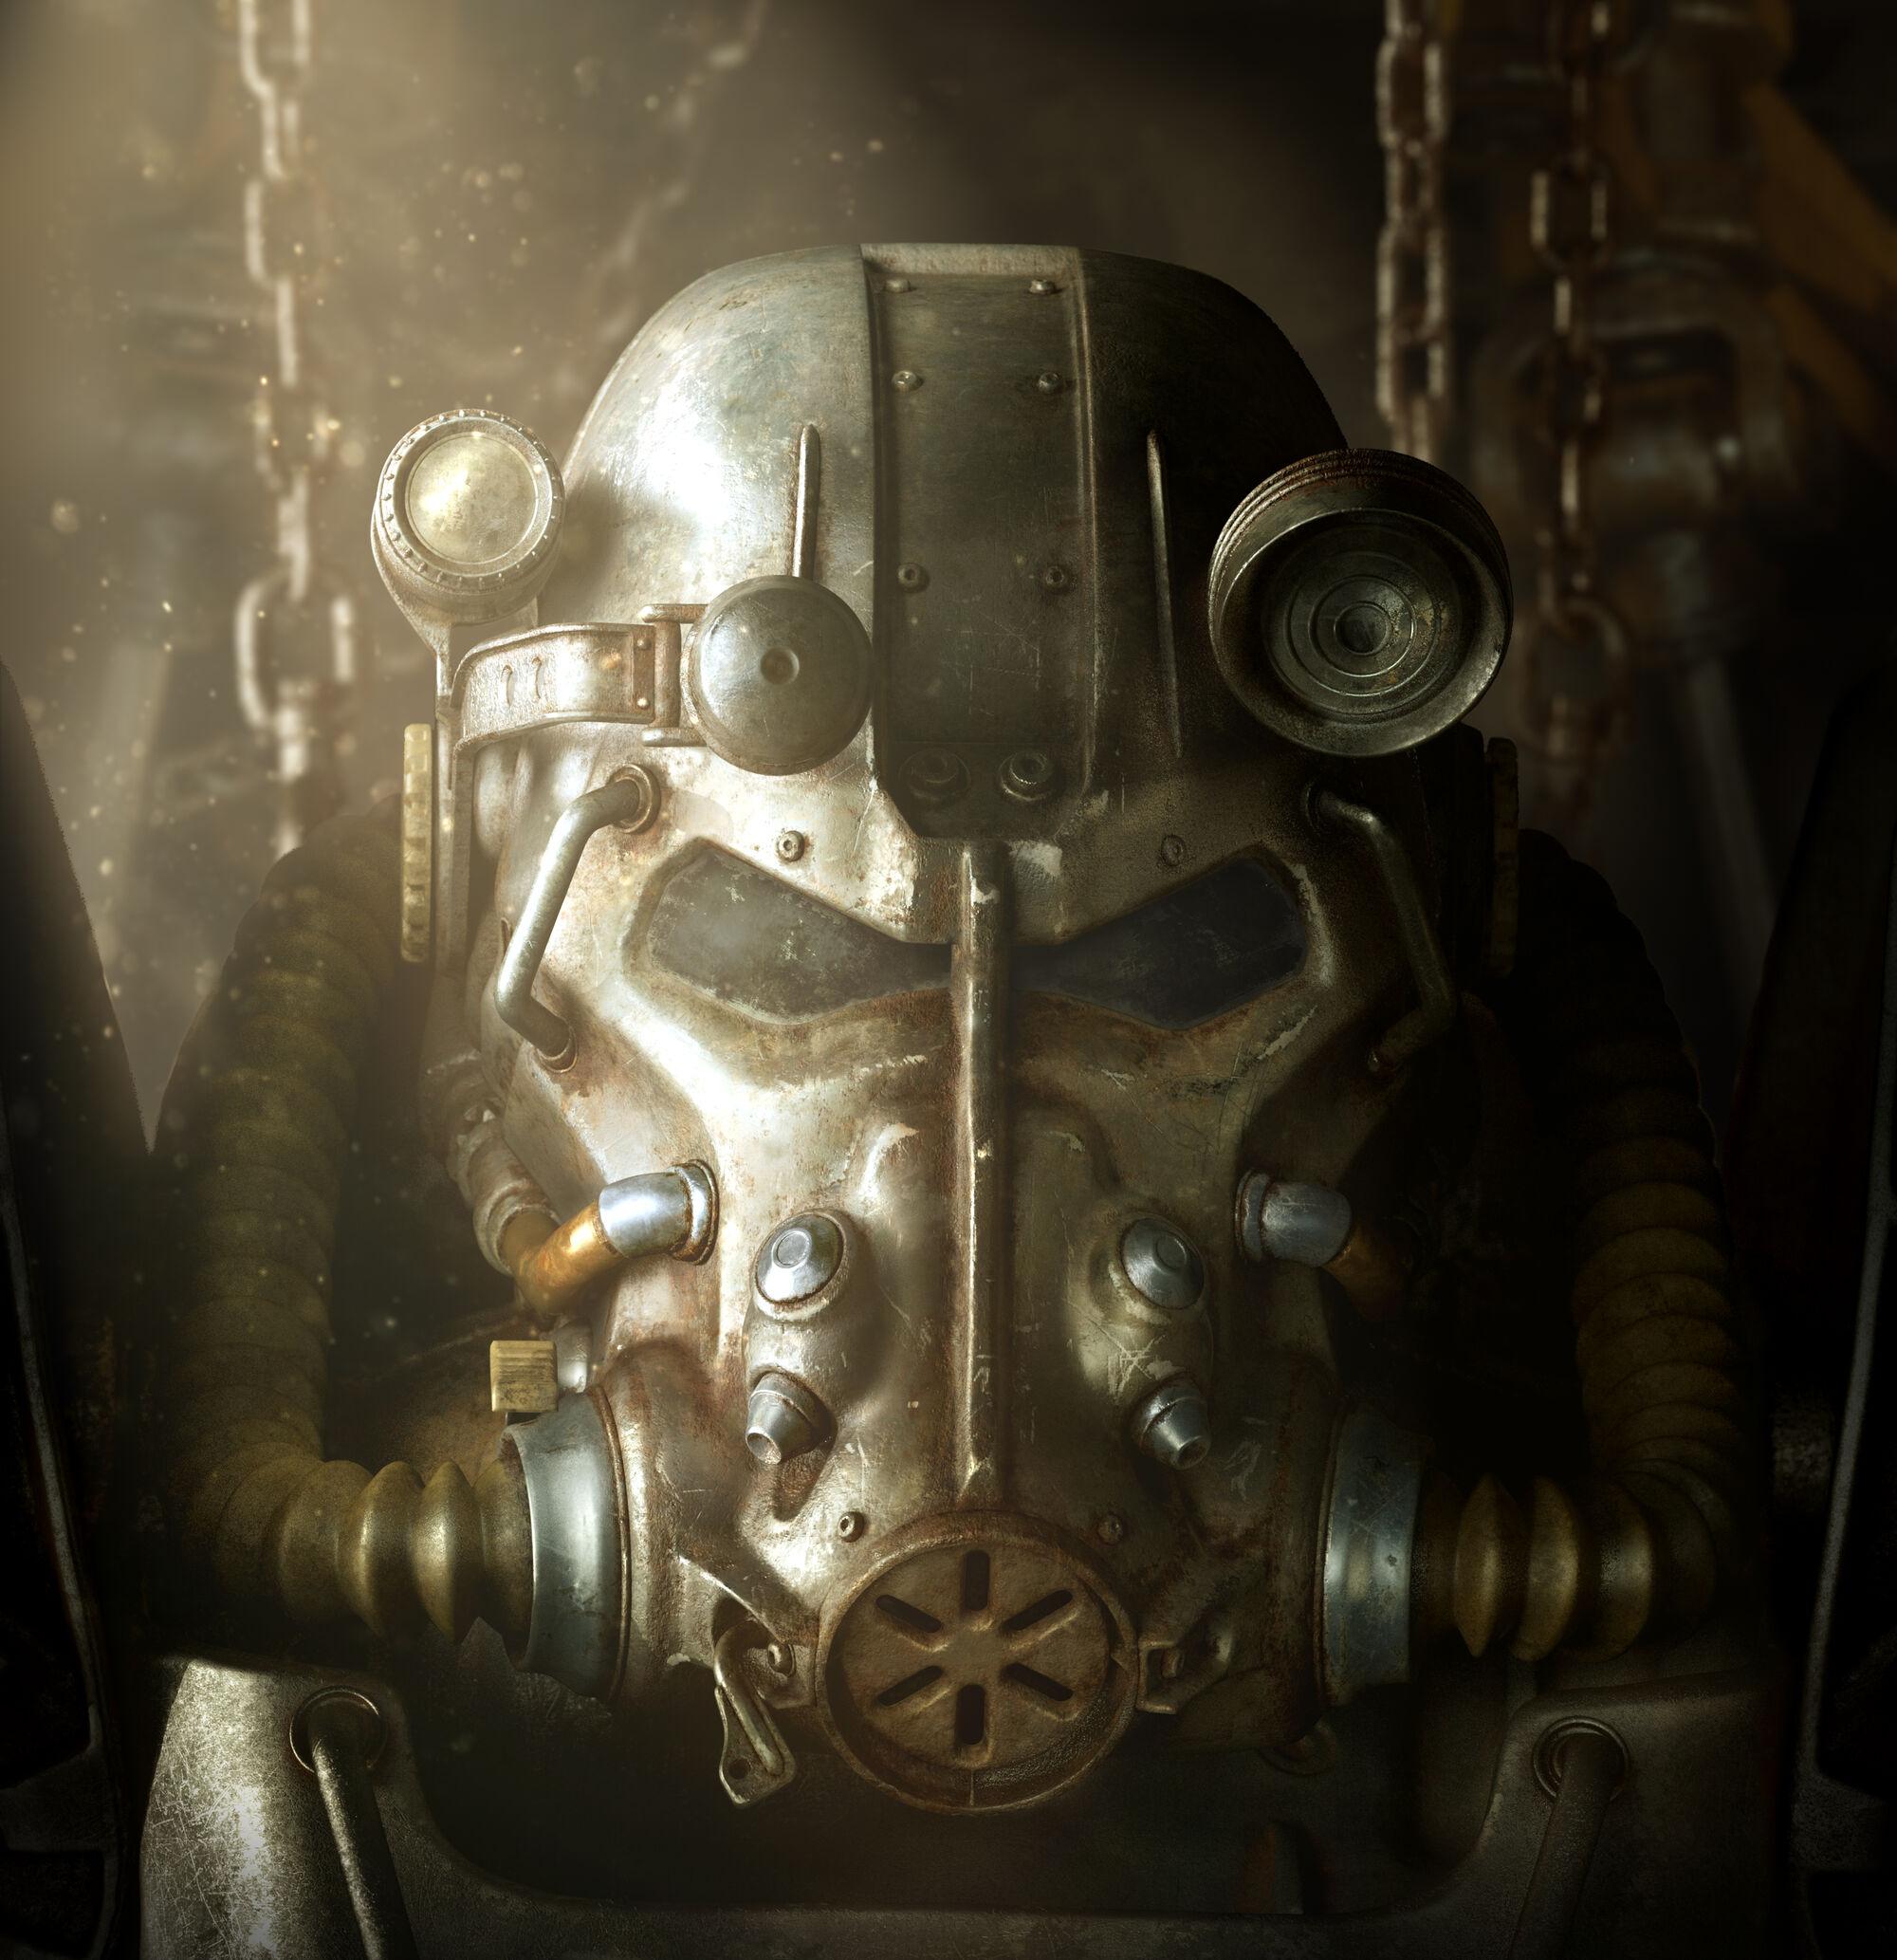 fallout 4 fallout wiki fandom powered by wikia